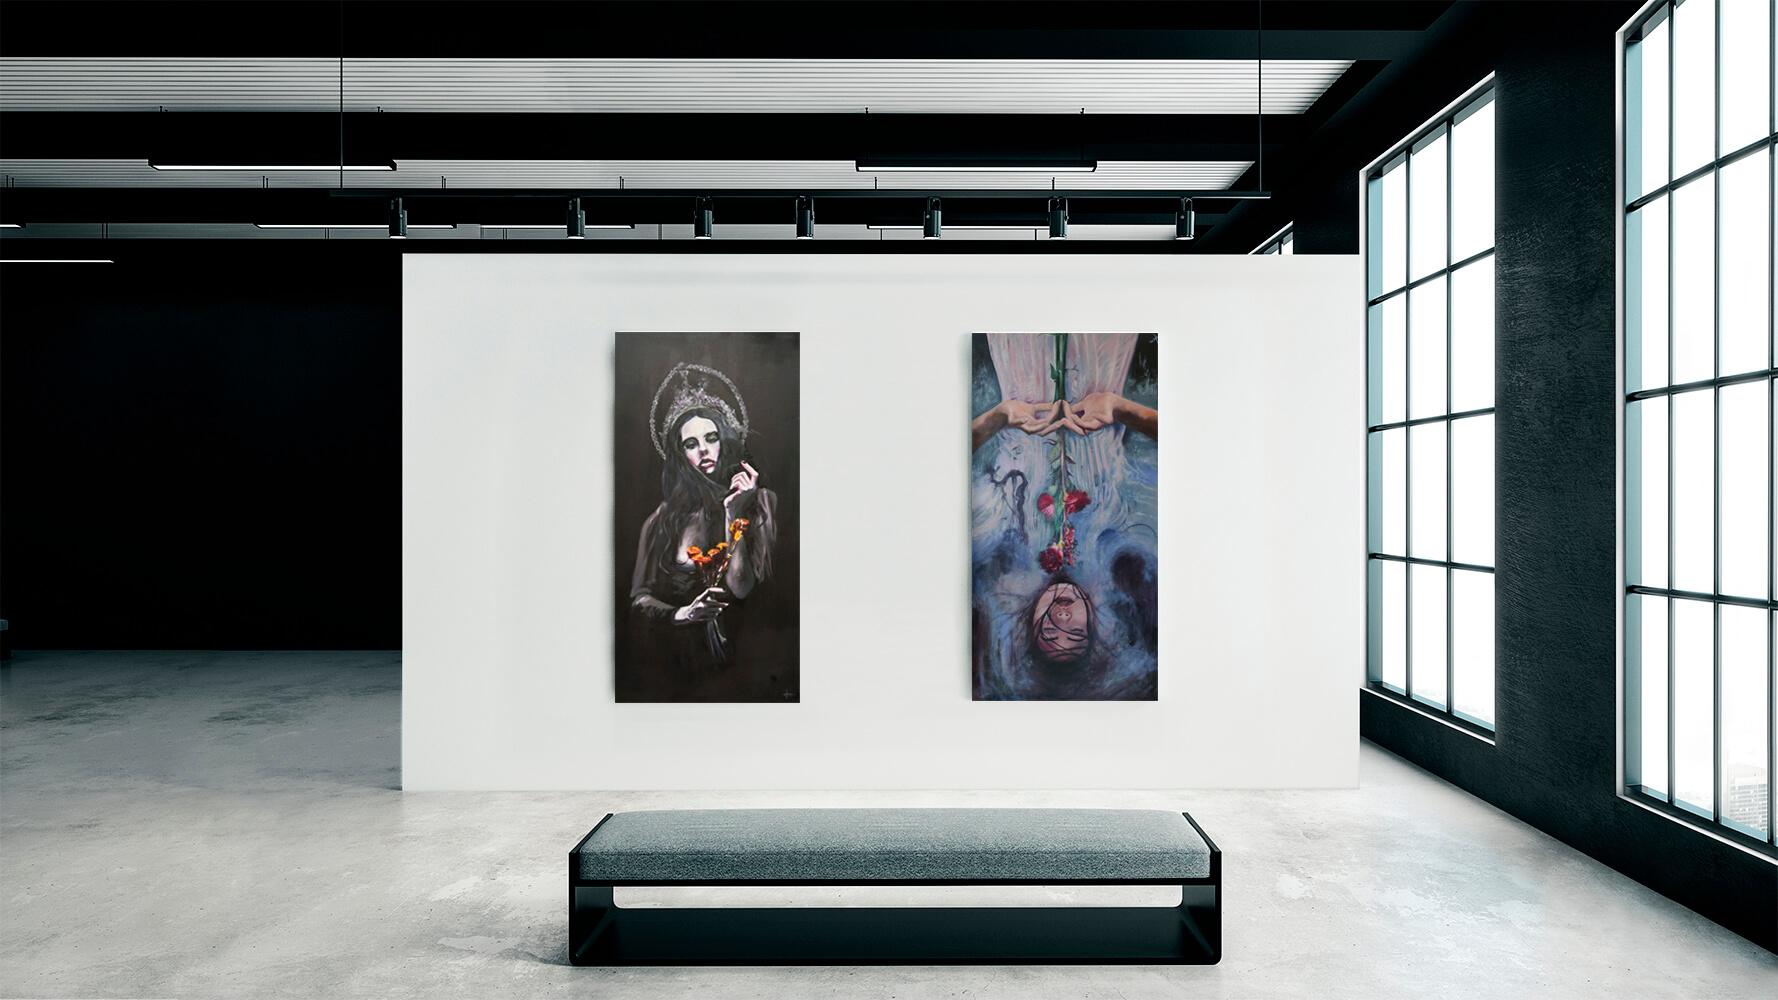 De-peccatis-et-morte-exposicion-colectiva-Horno-Art-Virtual-Galleryl-galeria-arte-pintura-fotografia-decorativa-decoracion-jose-moratalla